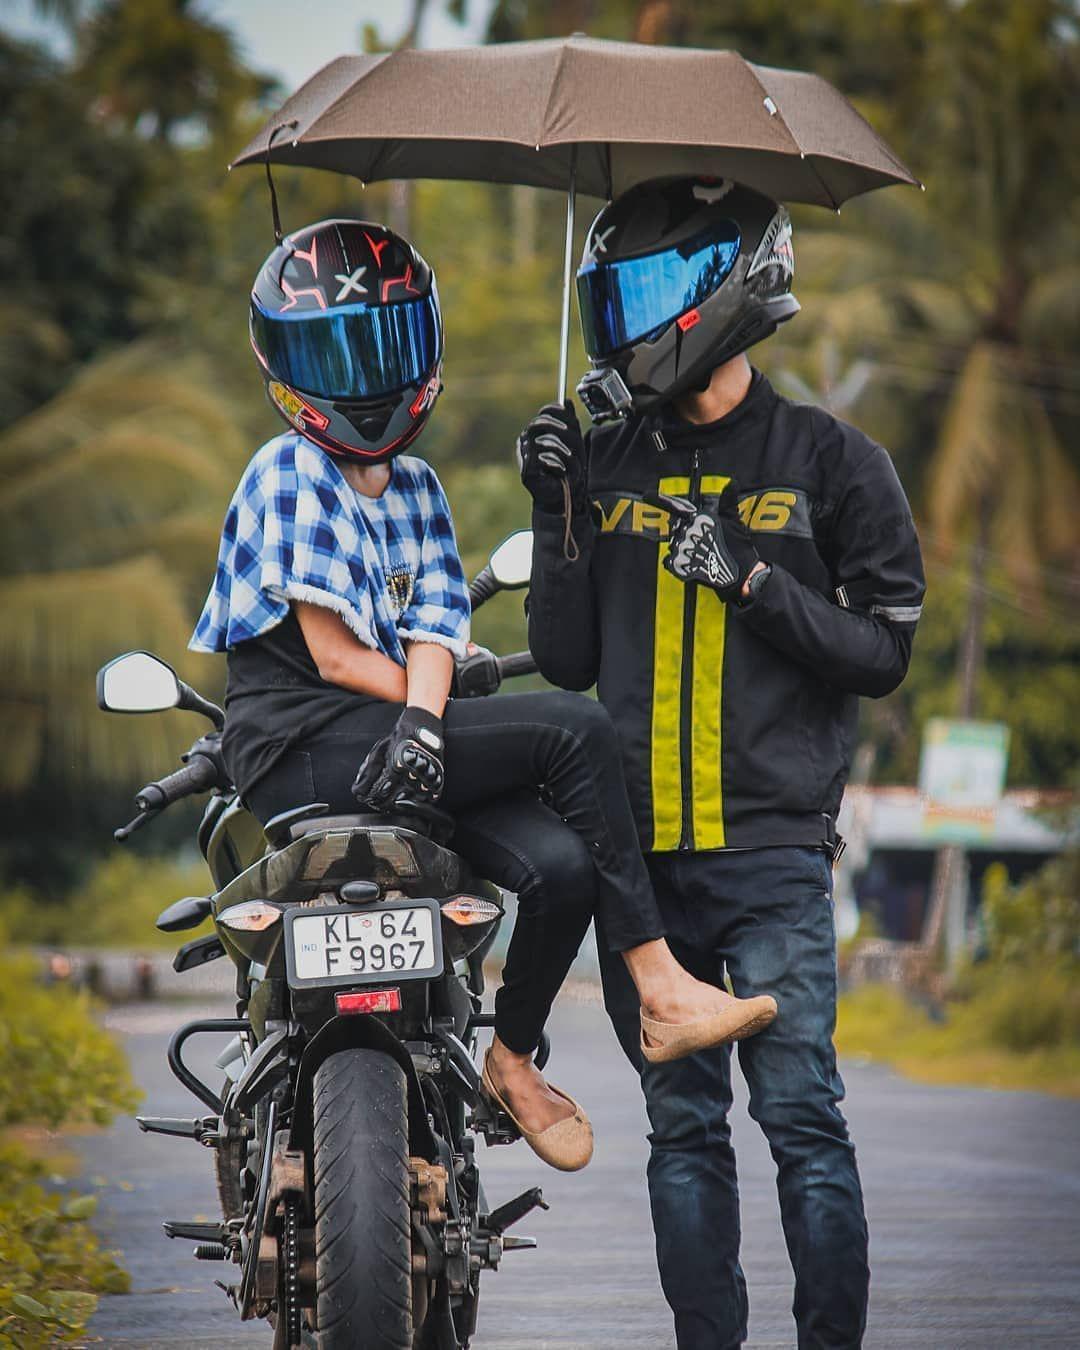 Follow Frkz F World Click Model Pro Shifter Admins Rishu Jr Praje Biker Love Bike Photo Biker Girl Get ktm duke couple wallpaper png